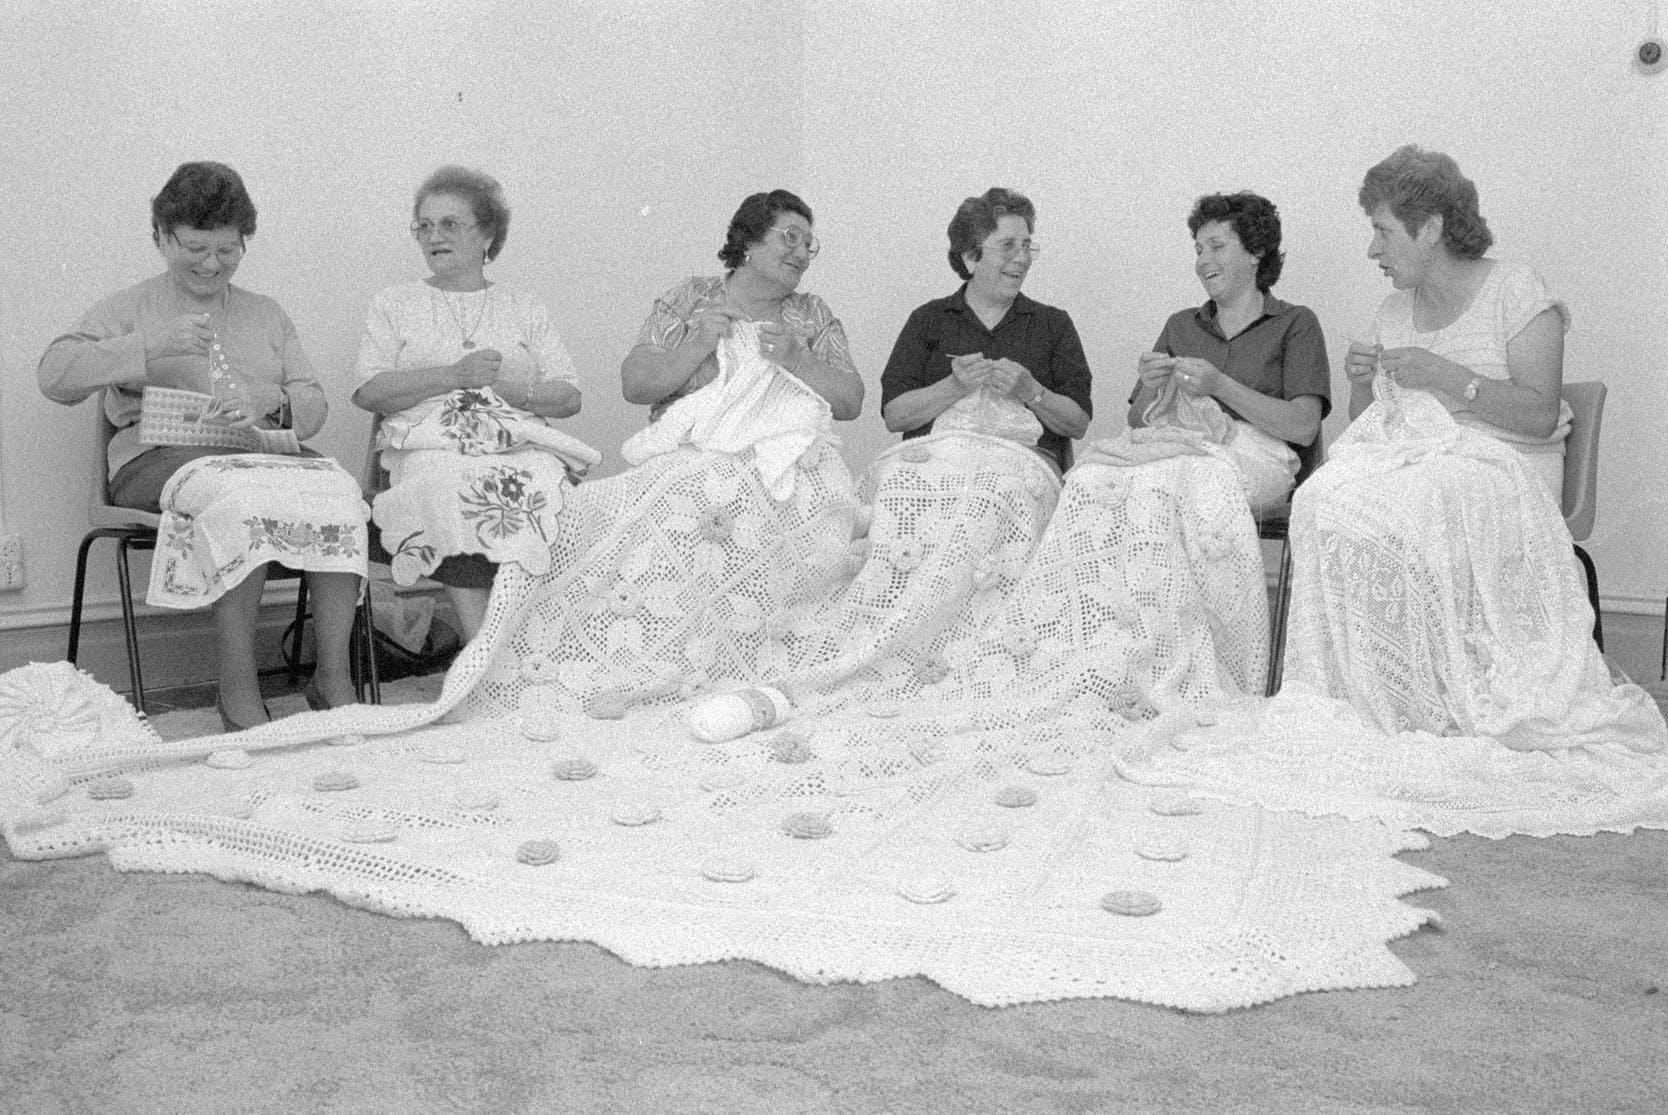 Italian women from the L' Amicizia Club doing needlework in St Paul's Church Hall